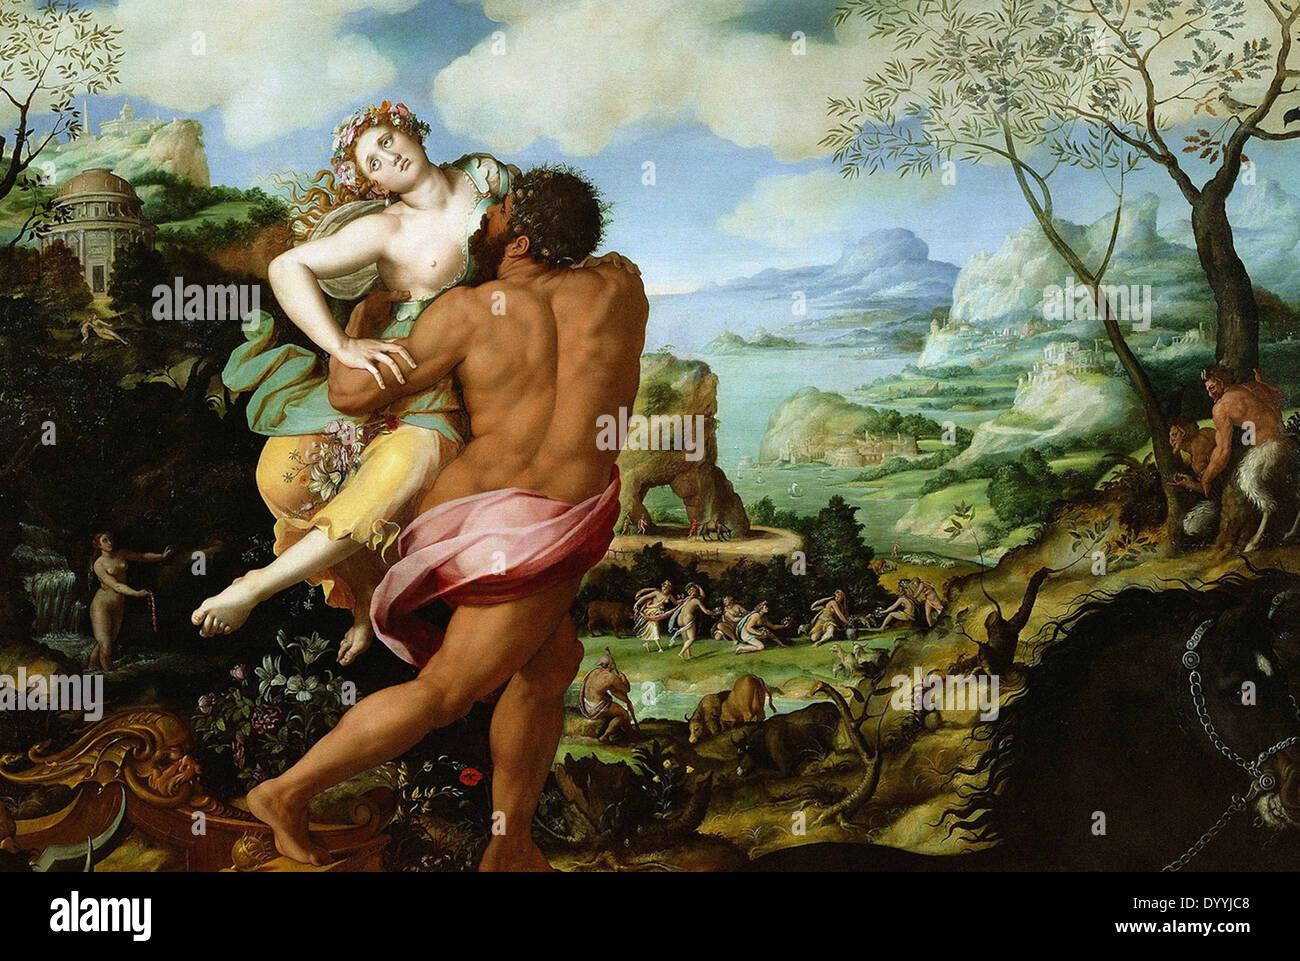 Alessandro Allori The Abduction of Proserpine - Stock Image